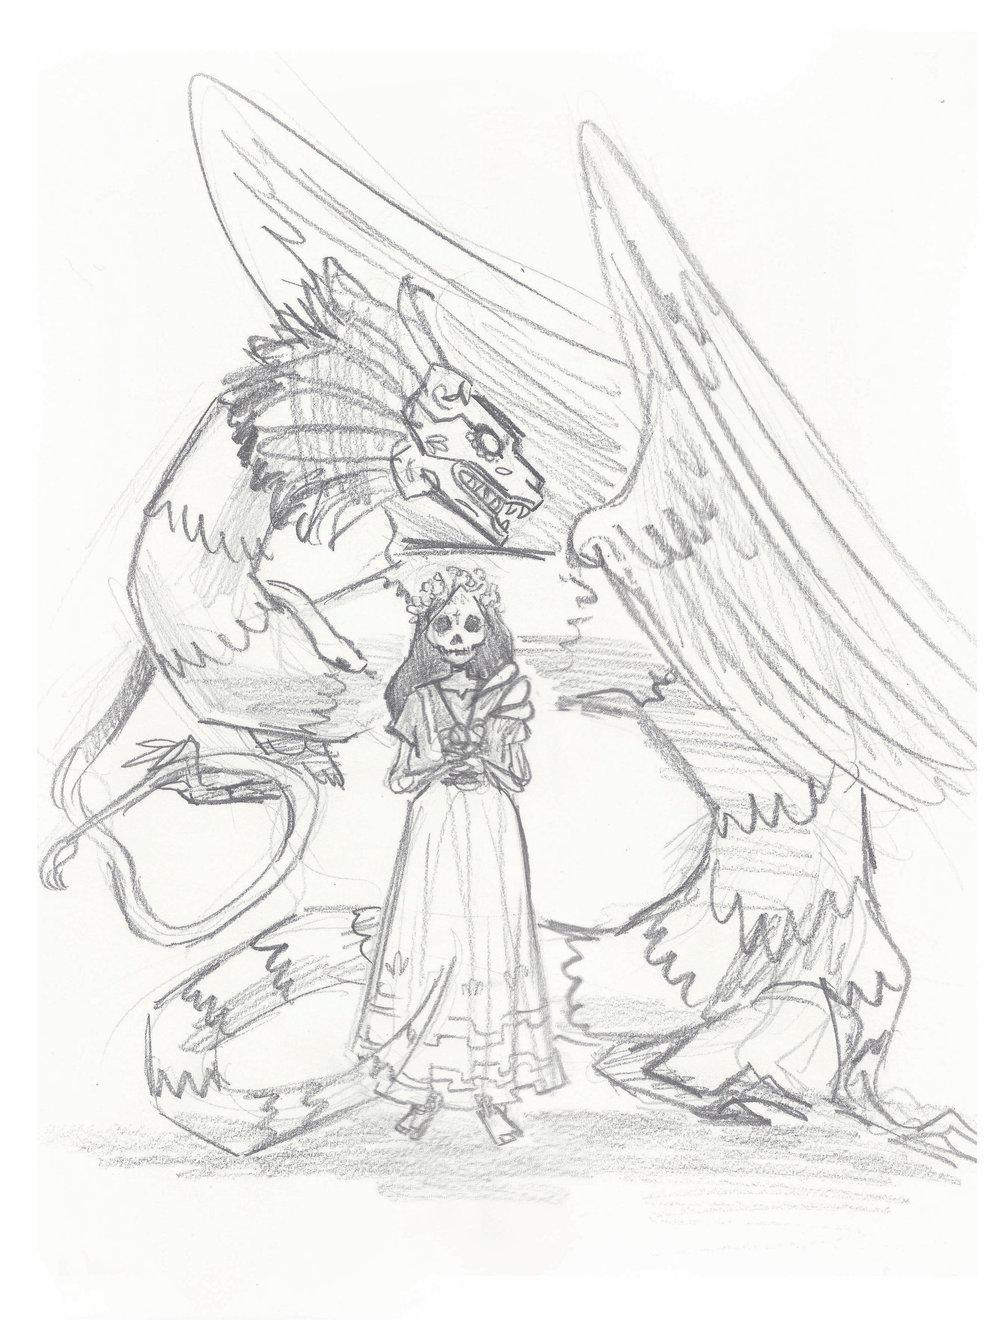 Quetzal_Sketch_1.jpg